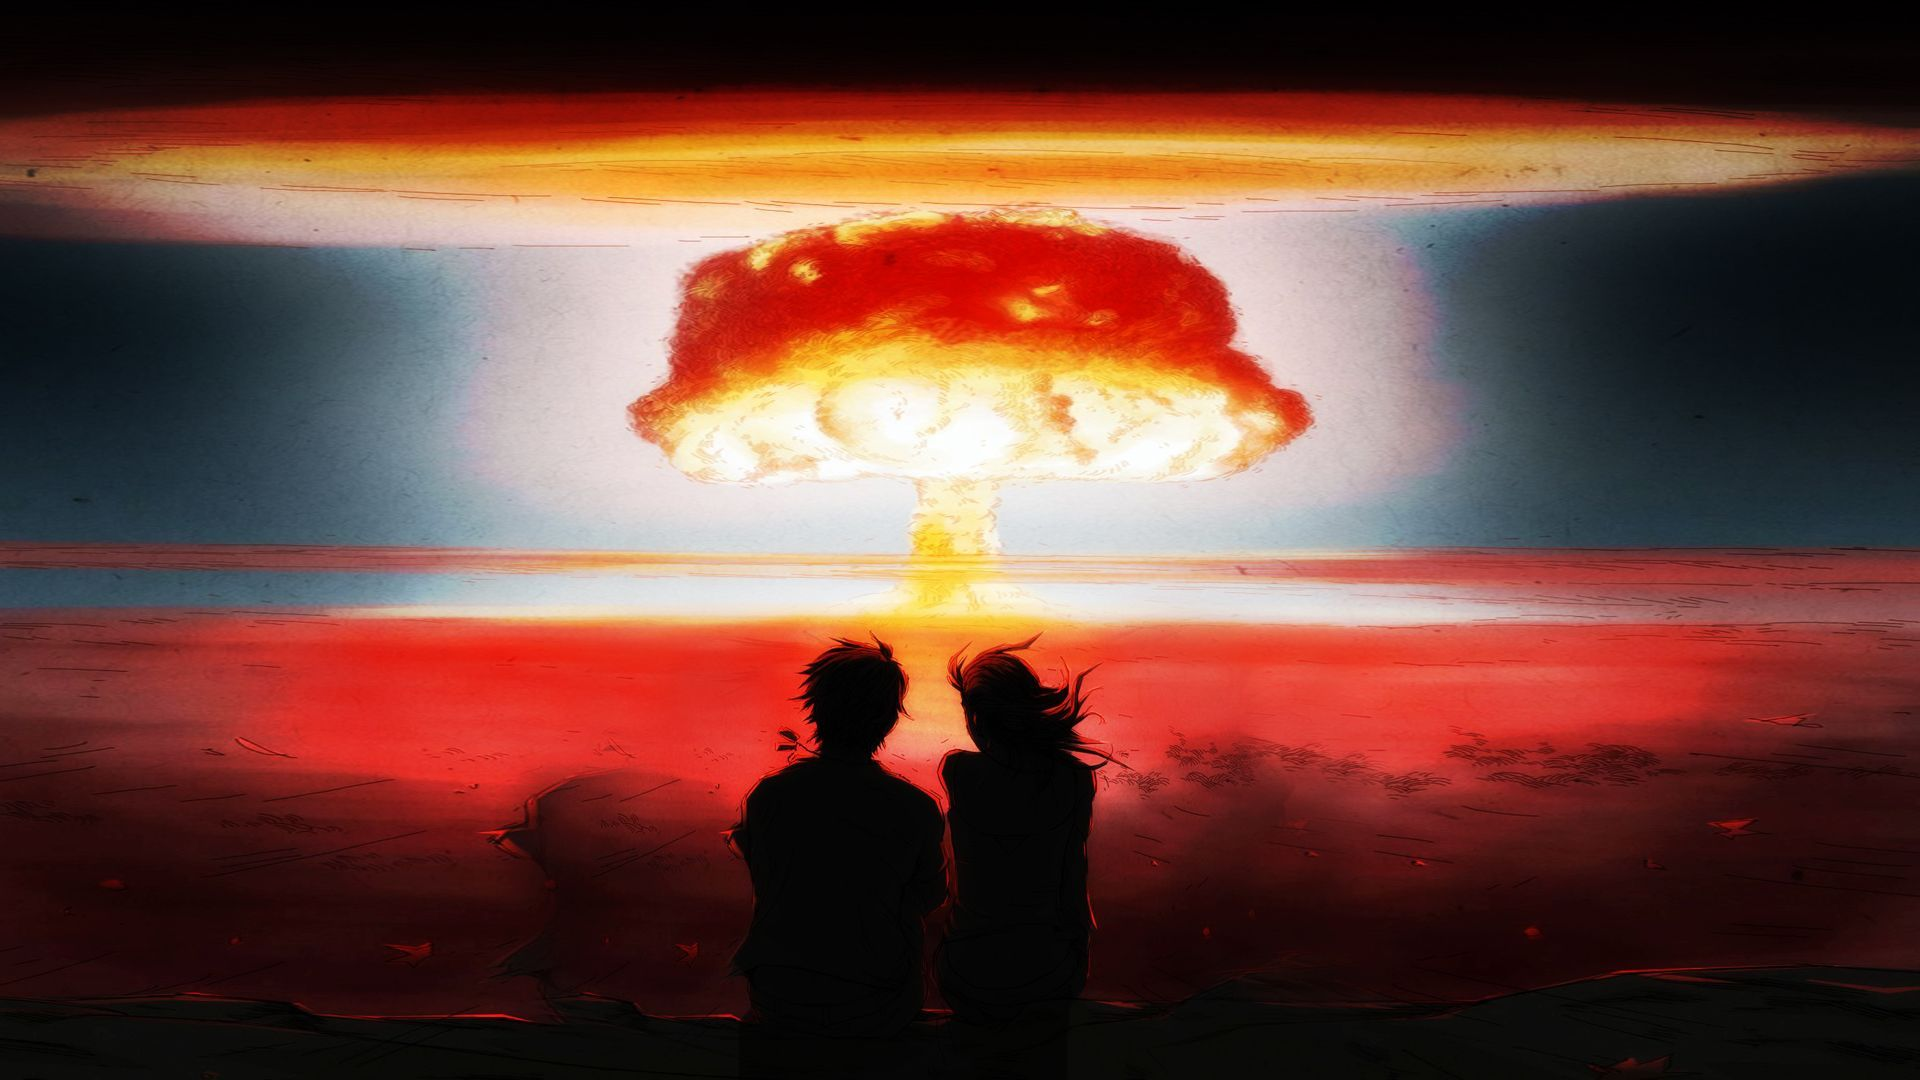 Nuclear Explosion Wallpapers - WallpaperSafari Real Nuclear Explosions Wallpaper